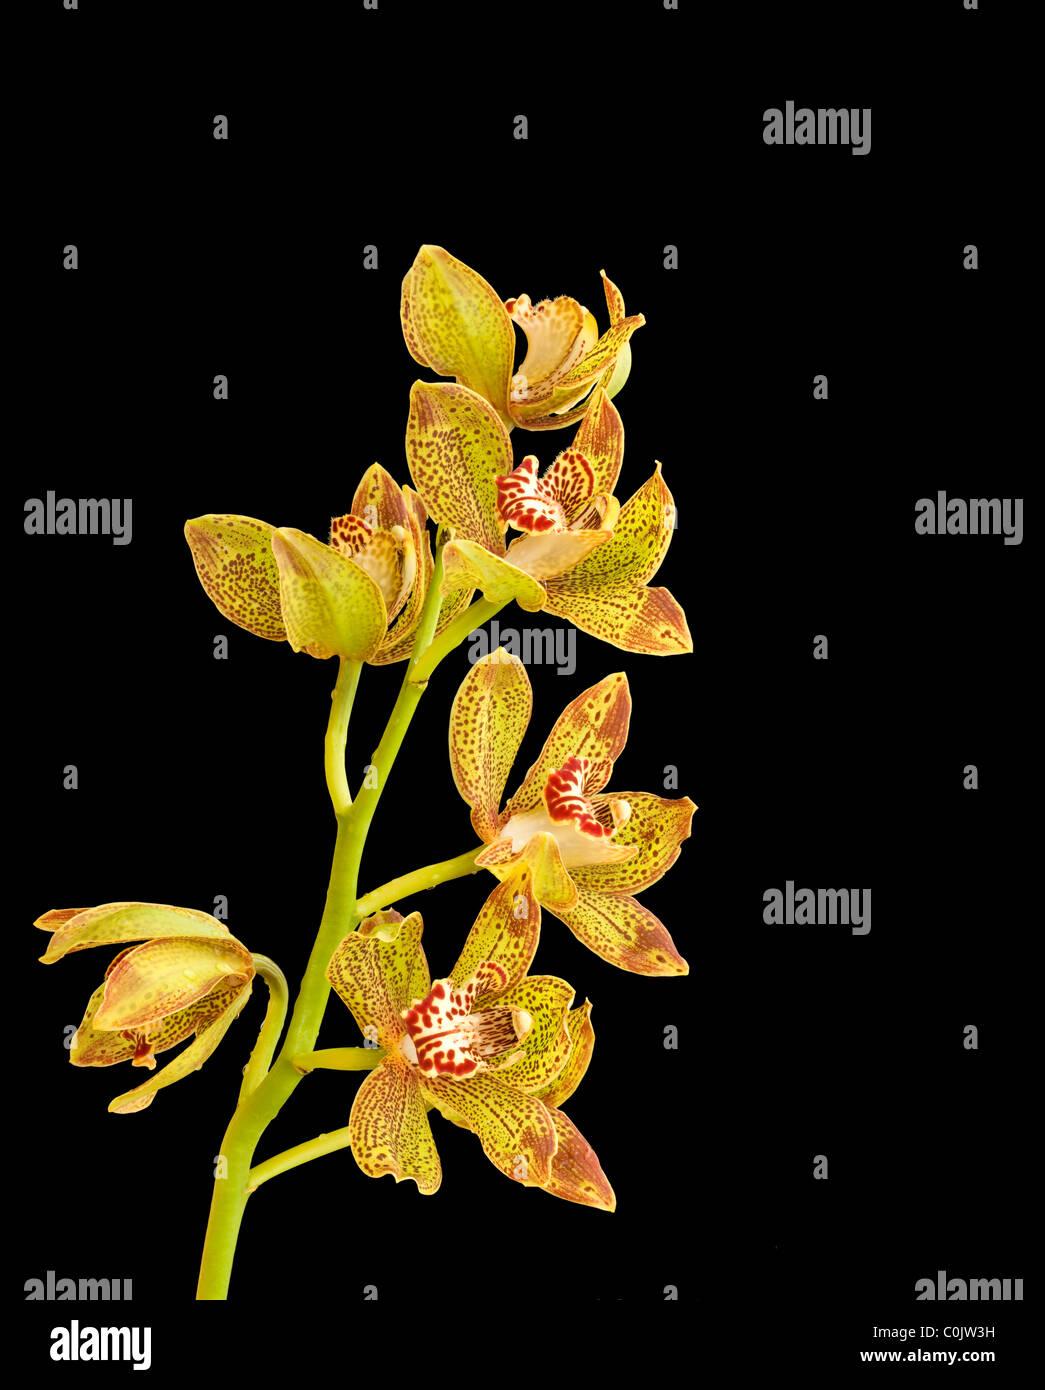 Via Horizons 'Simplicity' cymbidium orchid - Stock Image